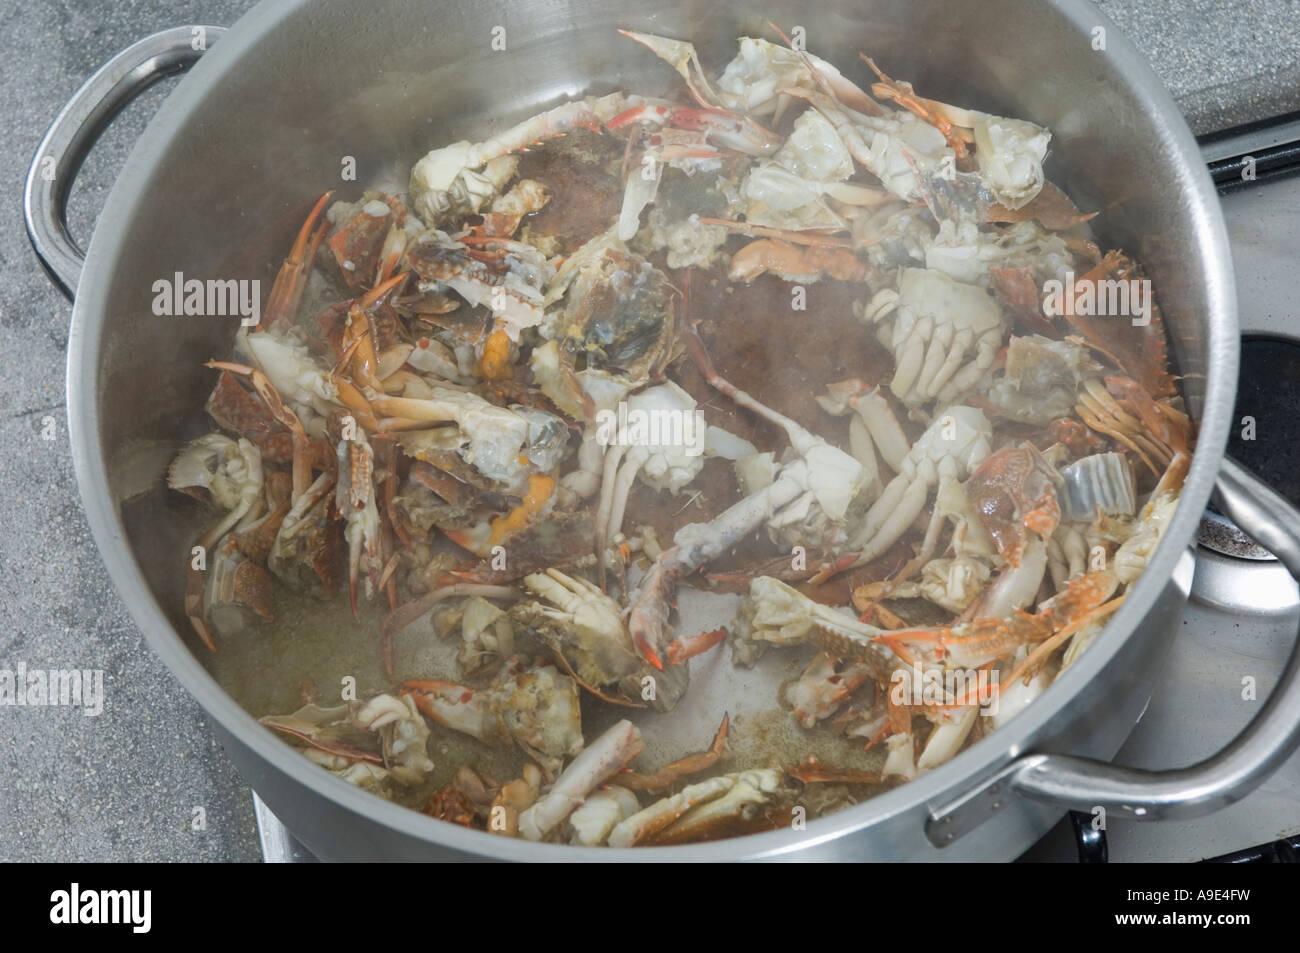 Cooking Crabs In Pot Stock Photo Alamy,Lemon Drop Shots With Triple Sec